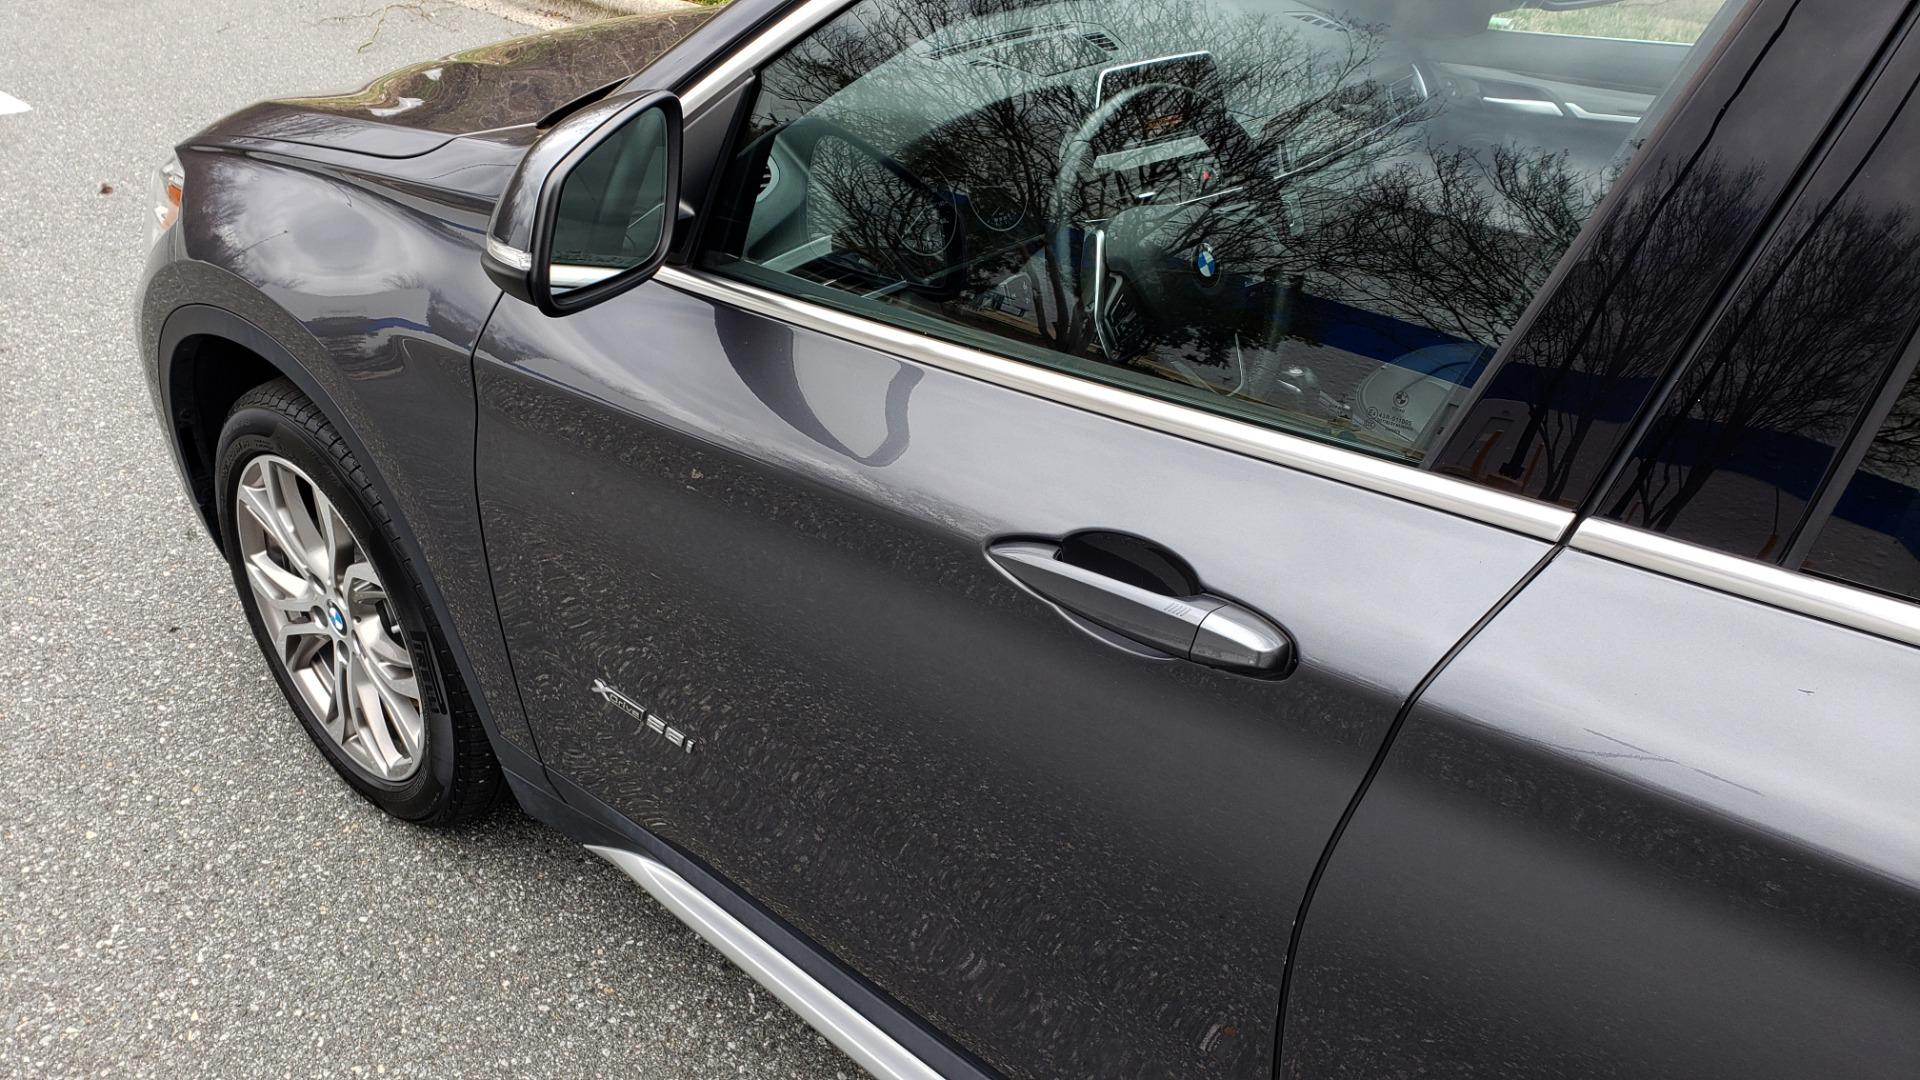 Used 2017 BMW X1 XDRIVE28I / PREM PKG / DRIVER ASST / NAV / CLD WTHR for sale Sold at Formula Imports in Charlotte NC 28227 7